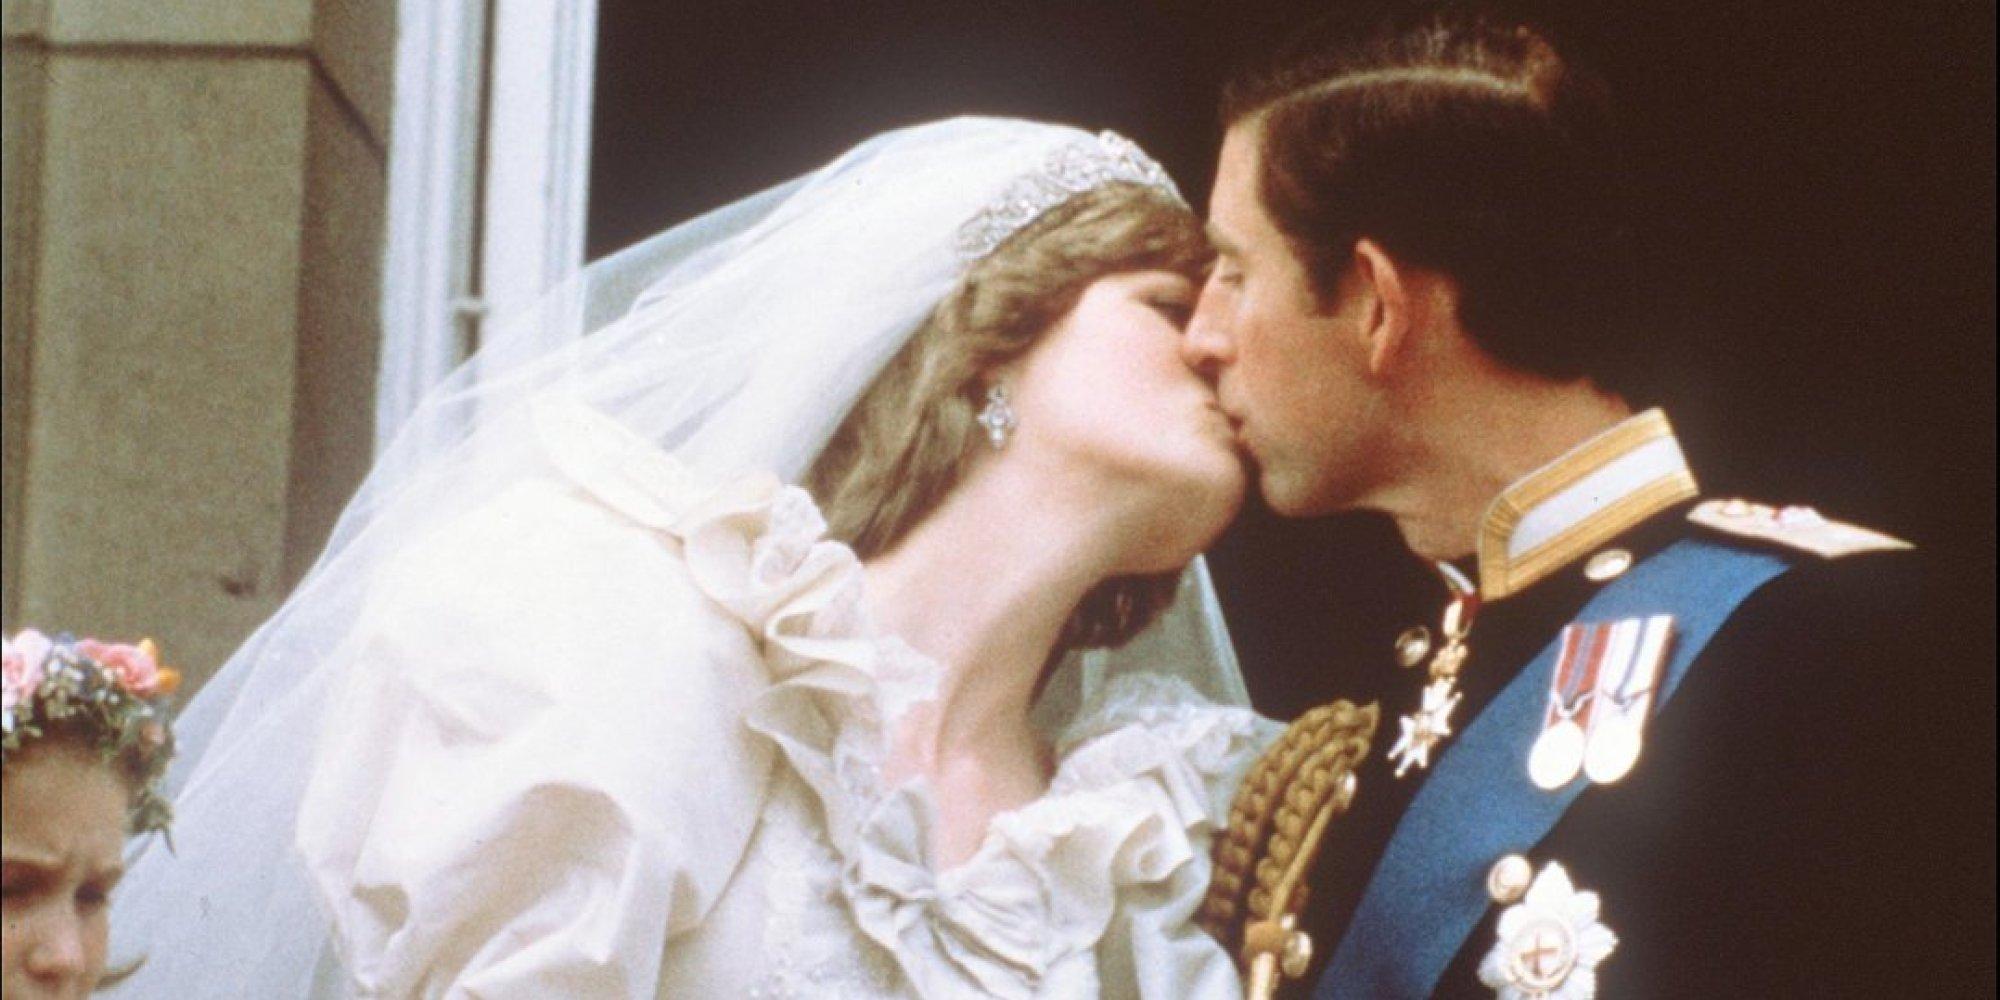 a look back at princess diana & prince charles' wedding | huffpost